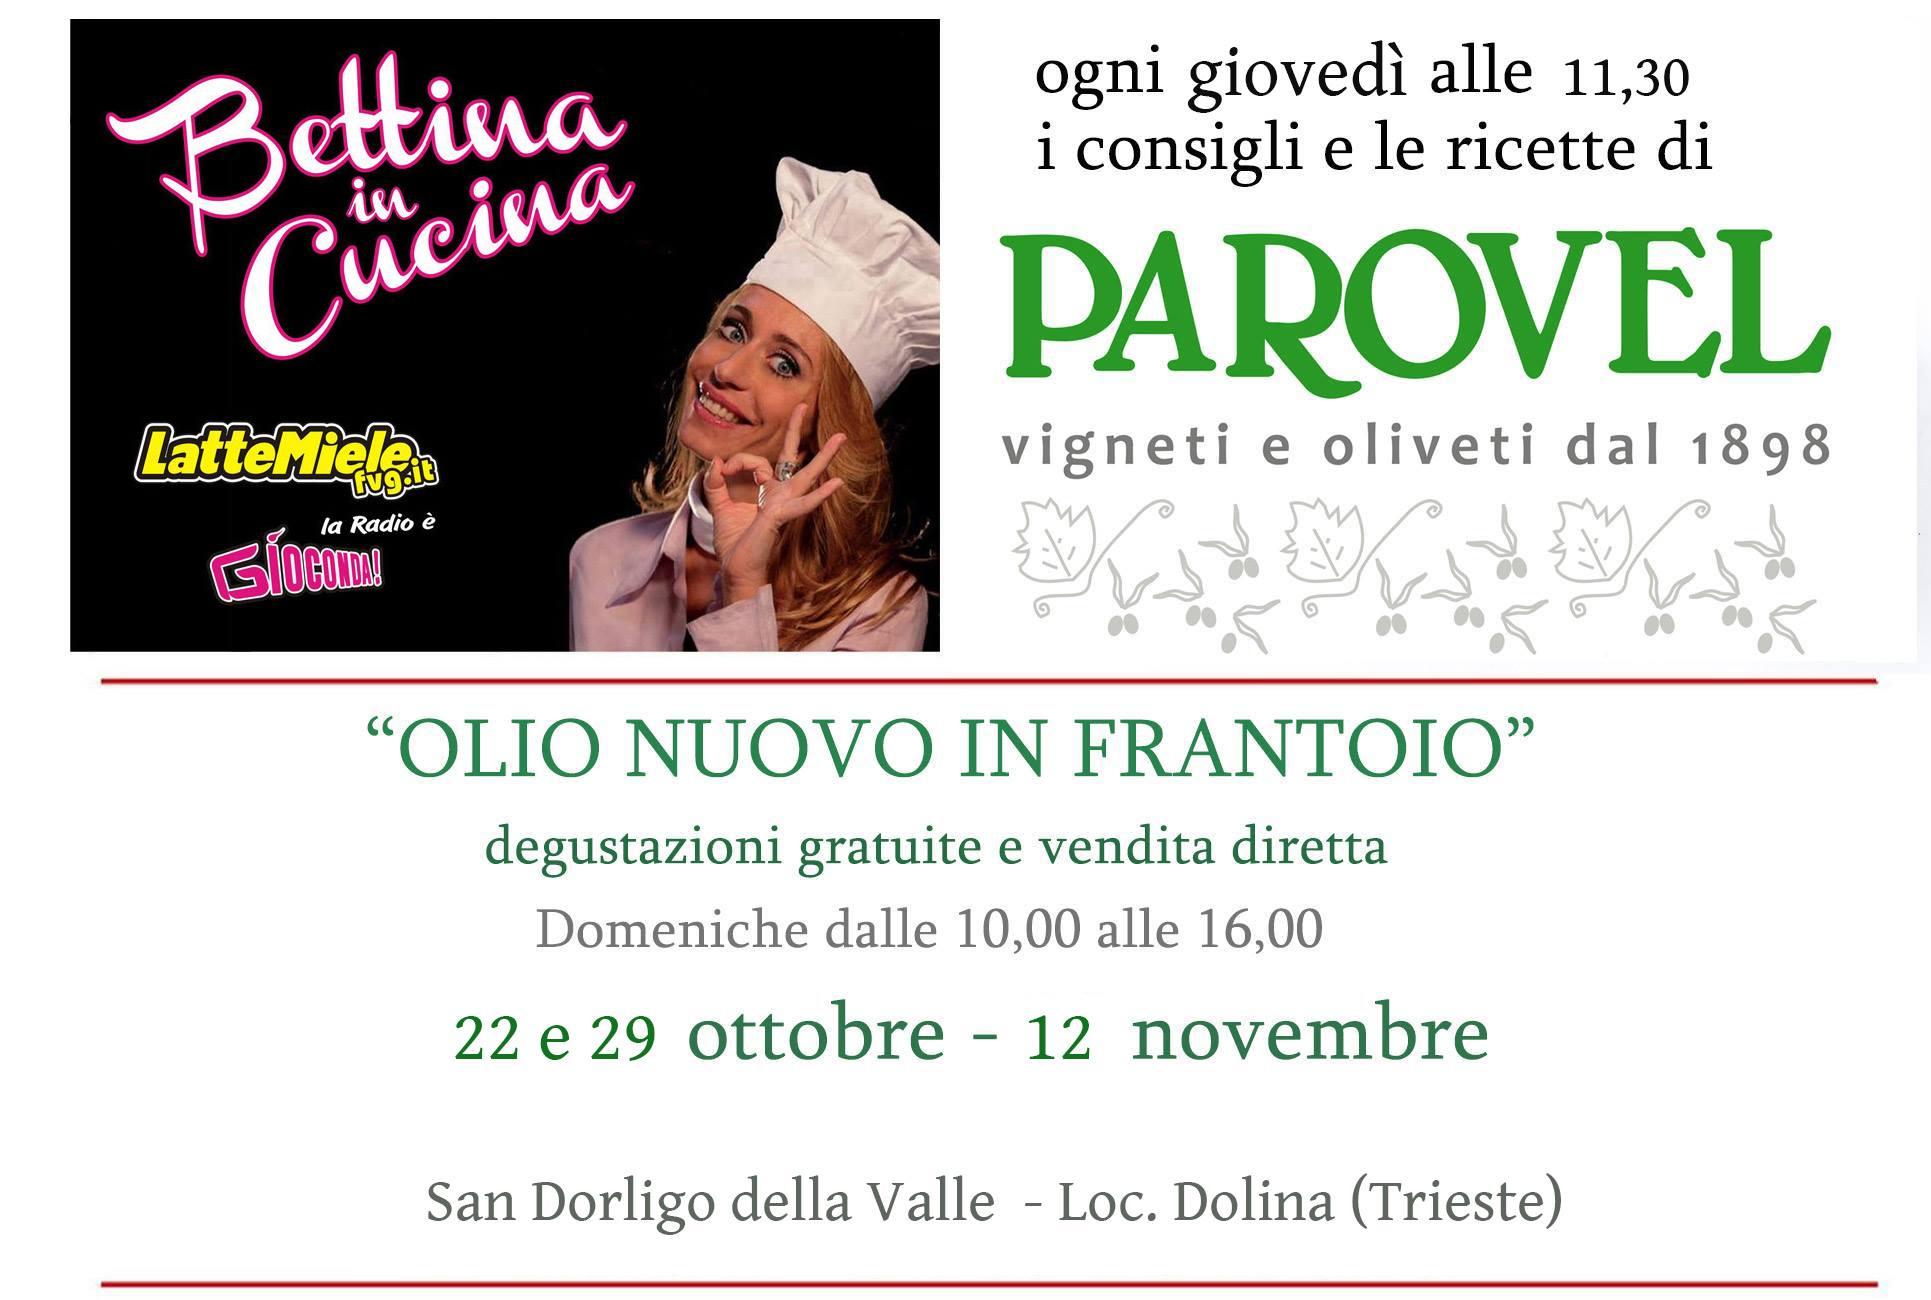 Bettina in Cucina con Parovel vigneti oliveti dal 1898